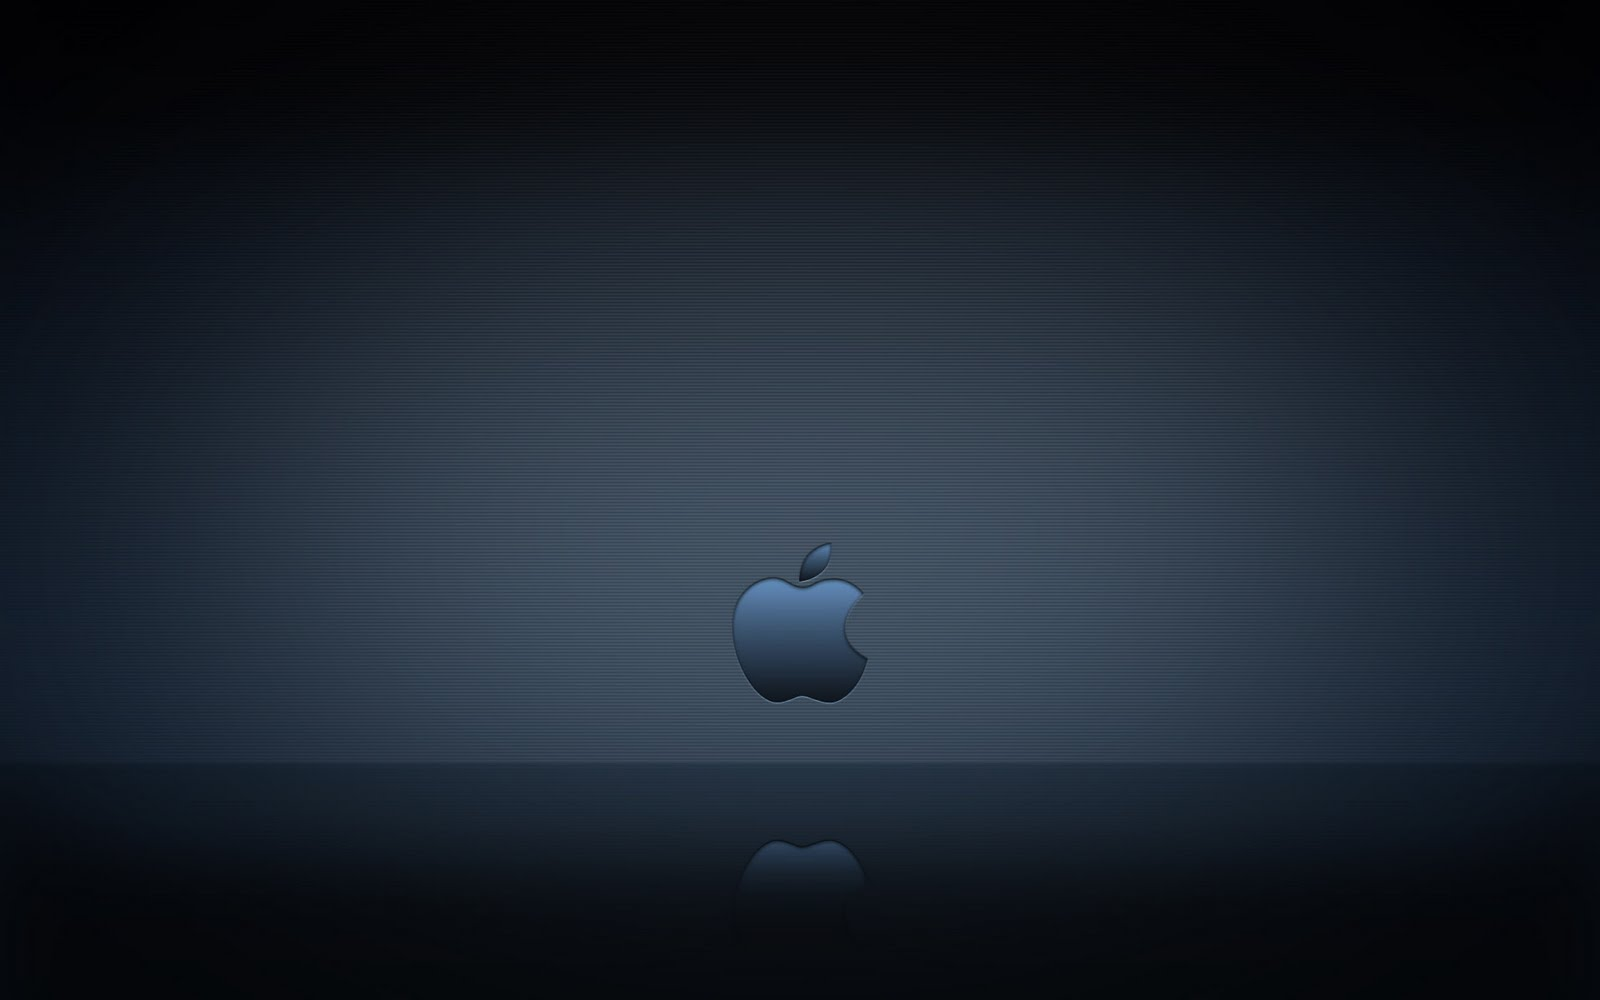 Download snow leopard for mac 10.5 8 vmware image